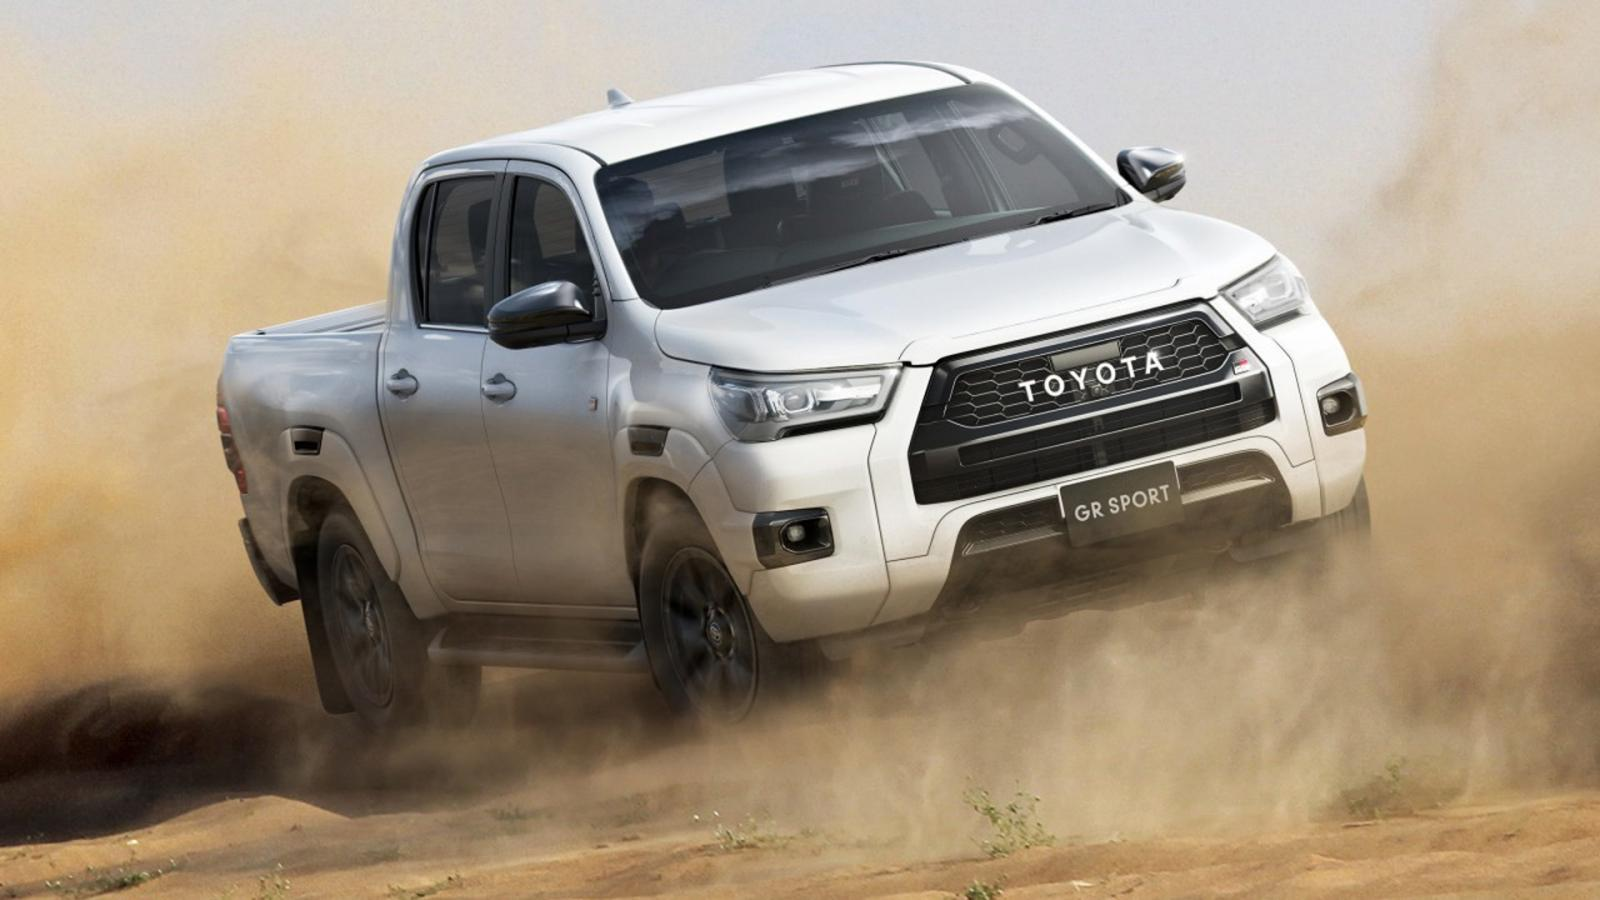 Toyota Hilux Gr Sport Japon (2)